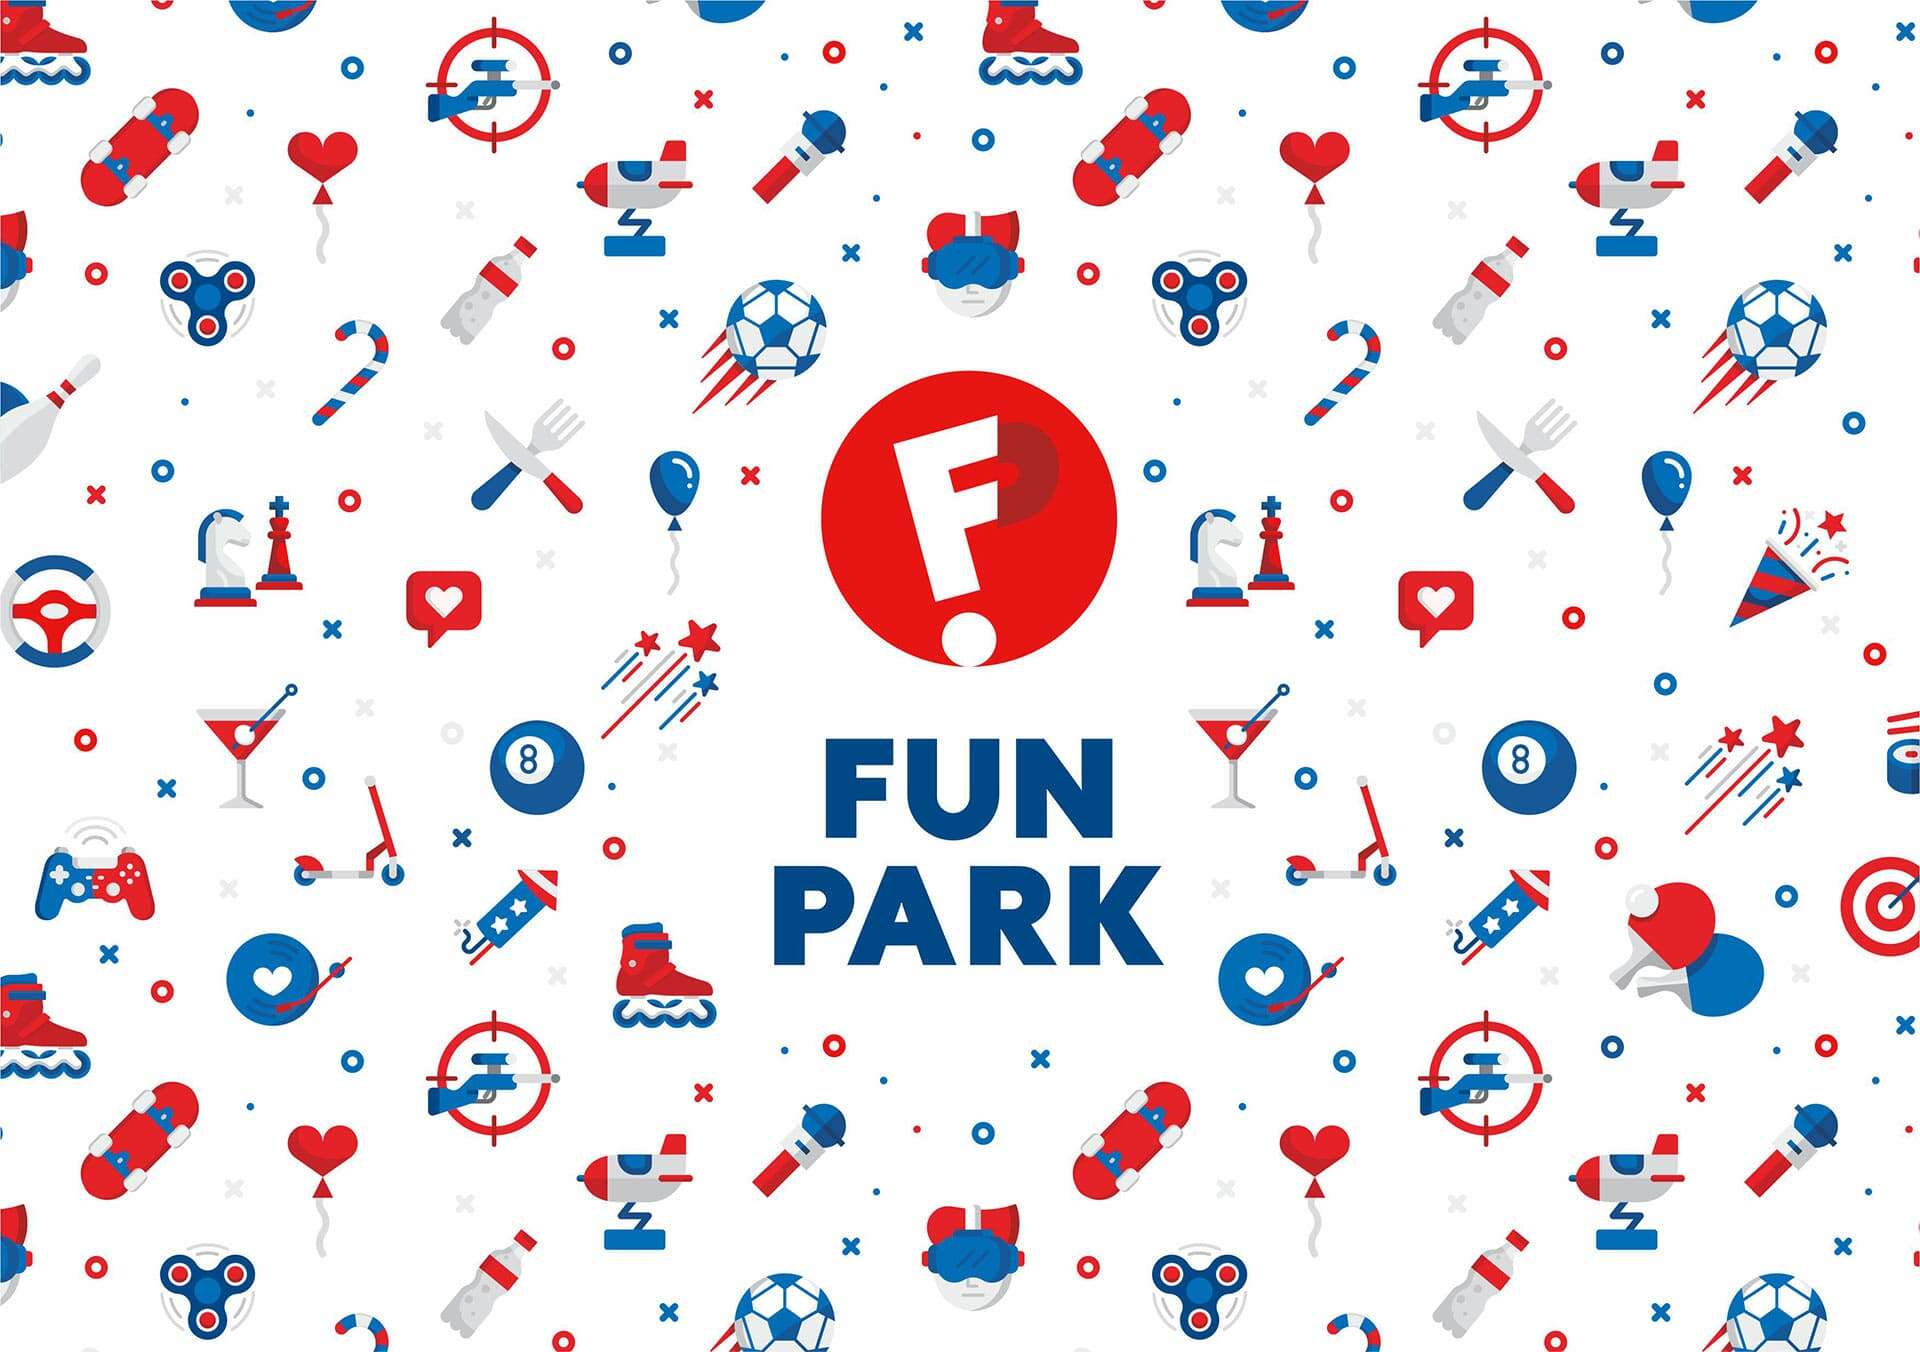 Fun Park фирменный паттерн